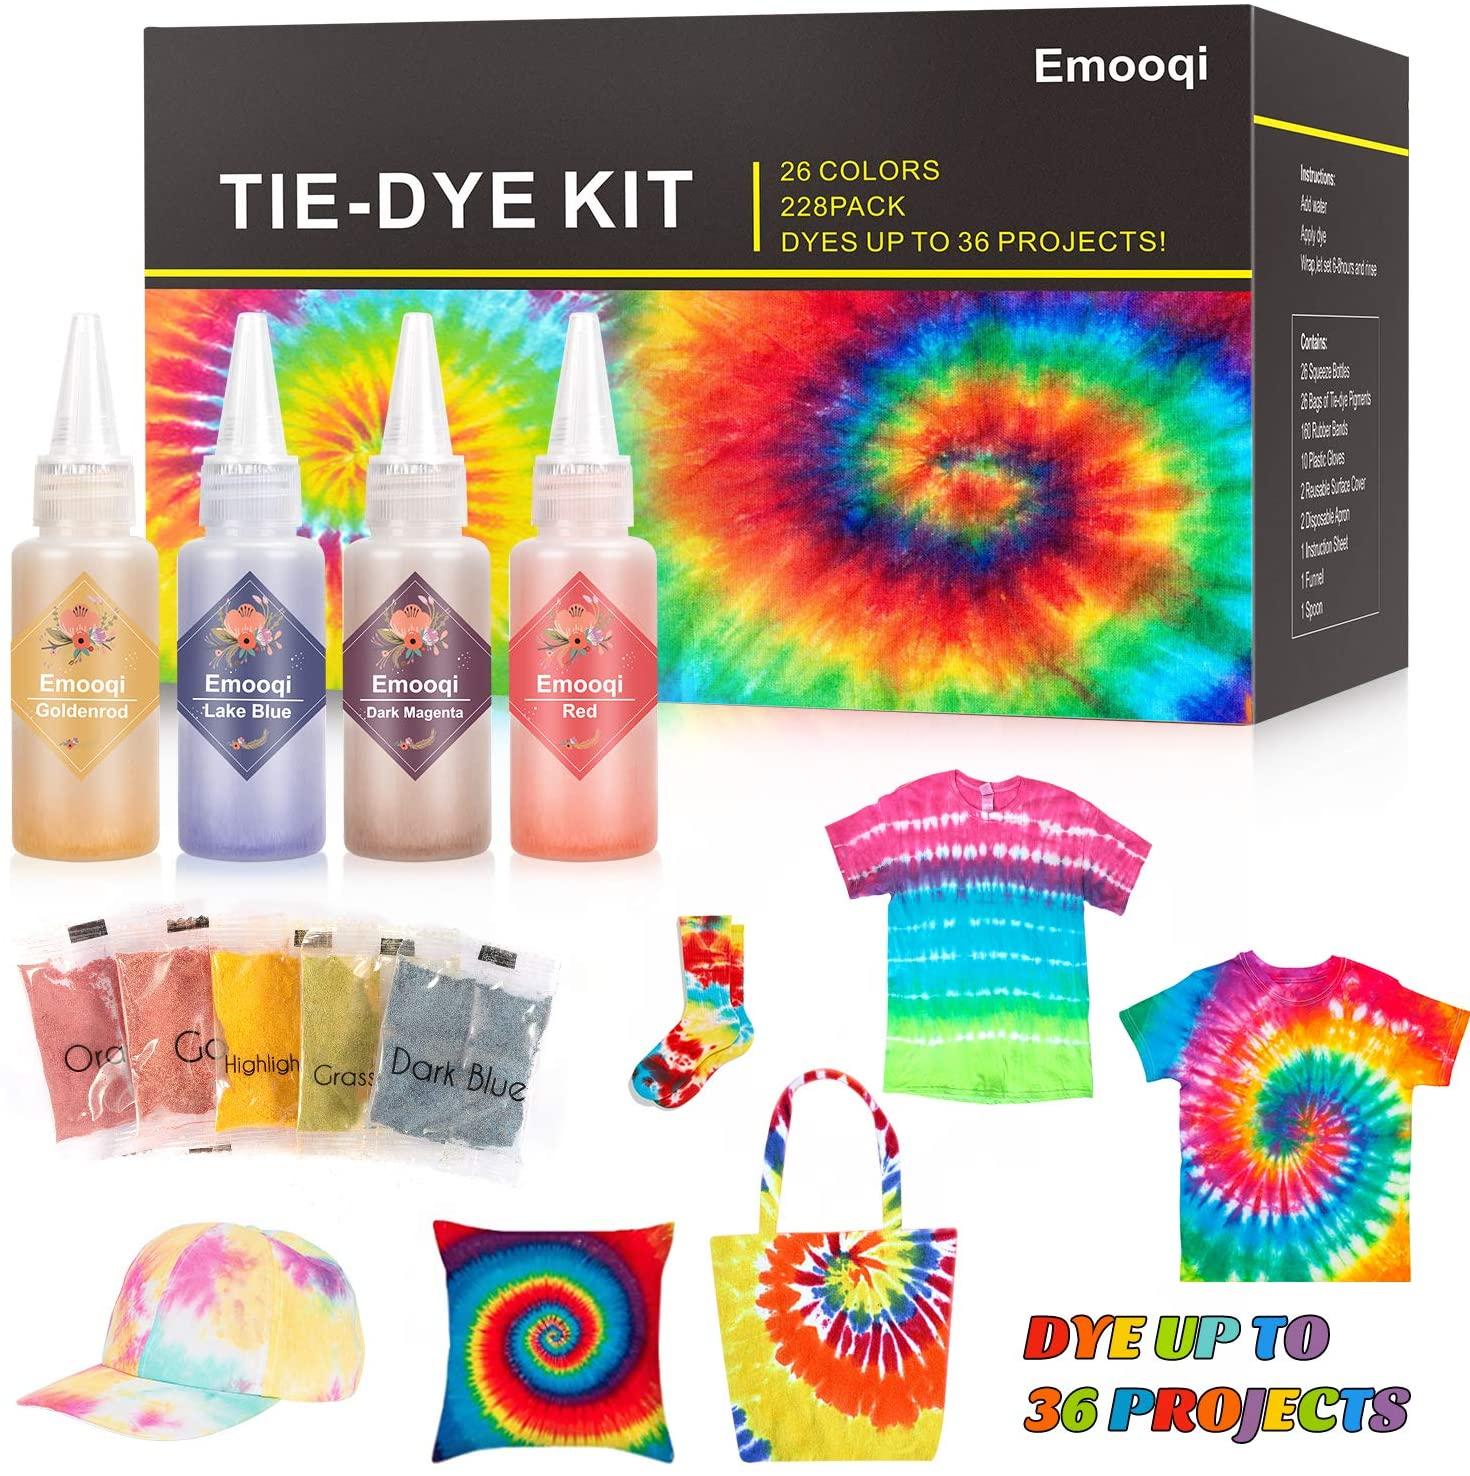 gifts for wife - Emoquii DIY Tie Dye Kit